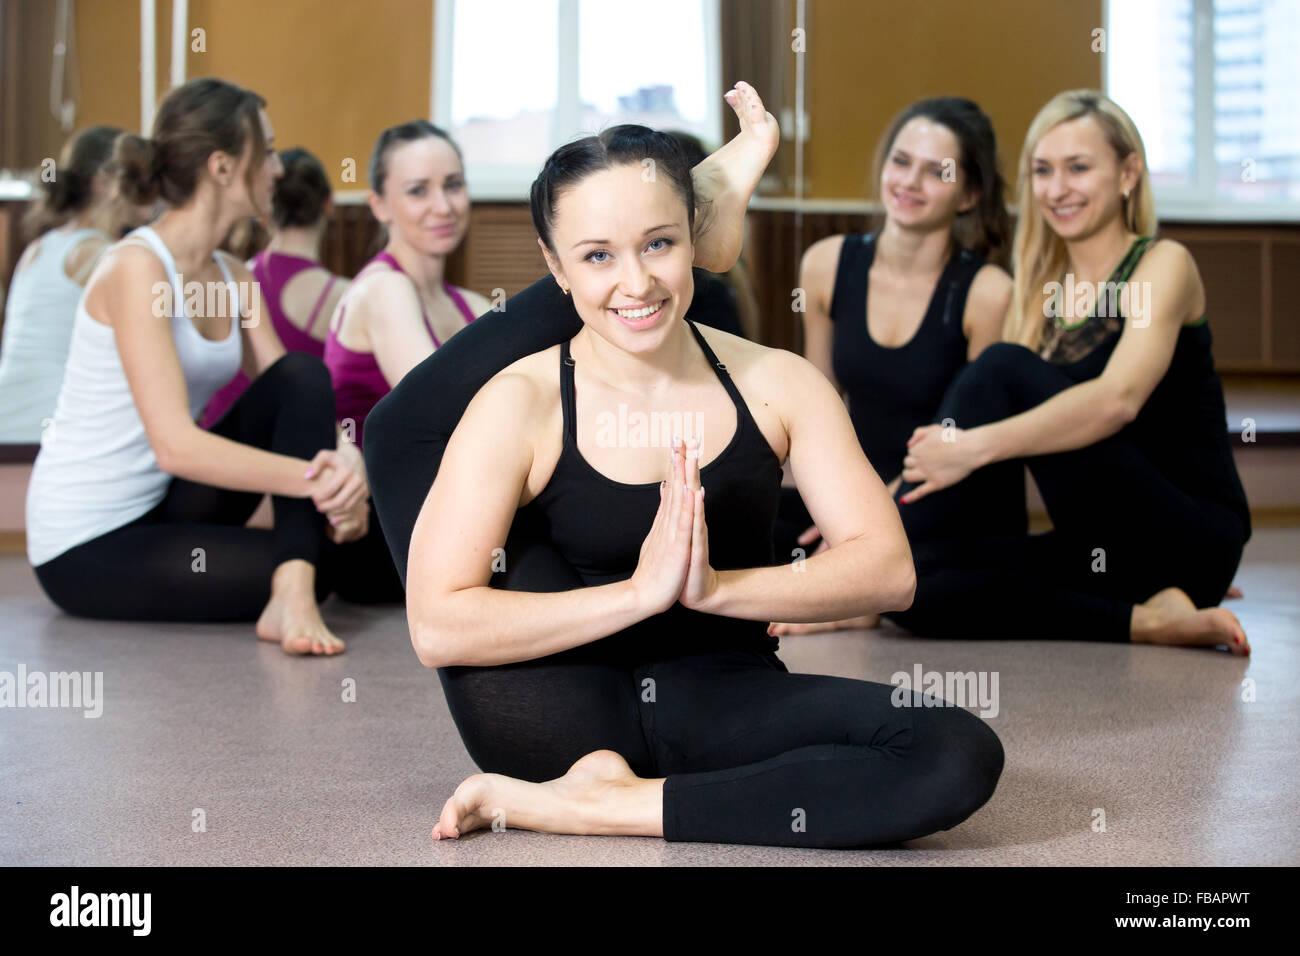 Smiling yogi girl in class in Yoga asana, exercising, stretching - Stock Image